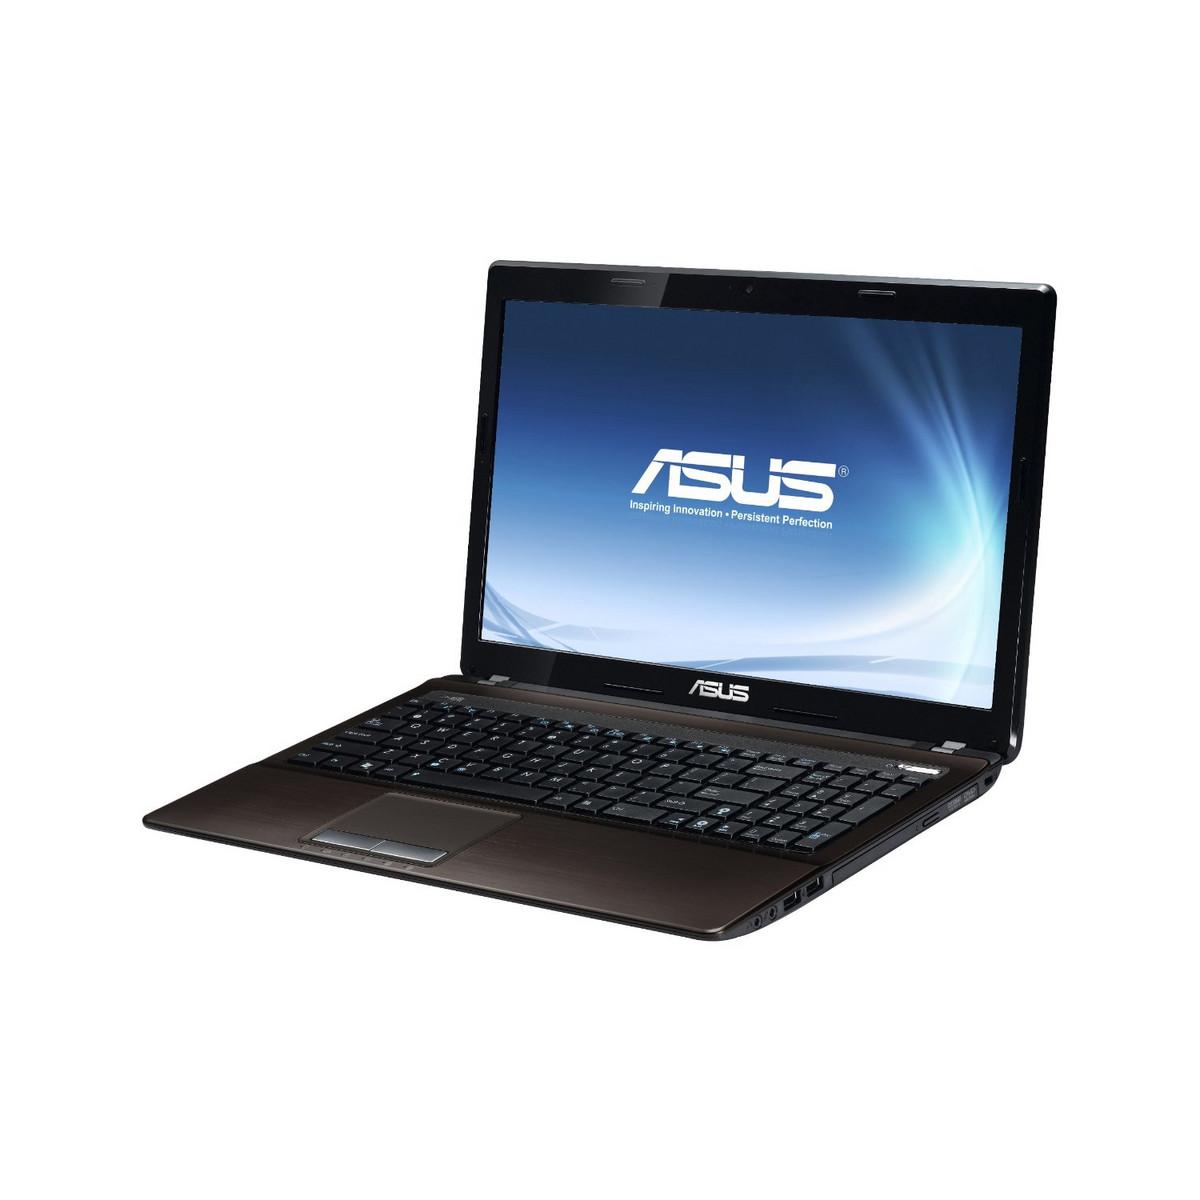 Asus K53SV Notebook Virtual Camera Windows 8 X64